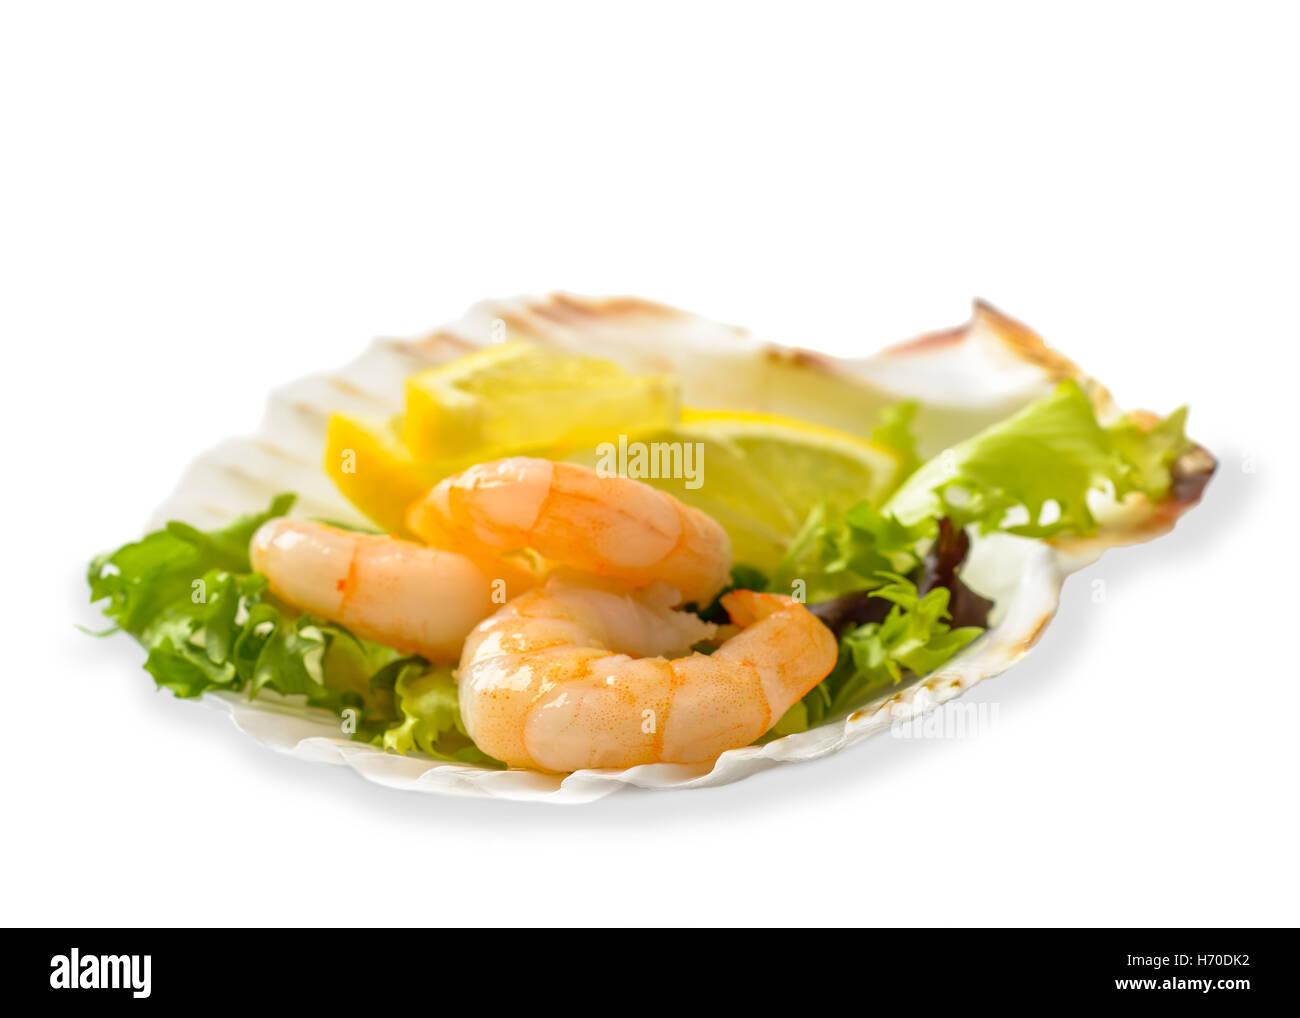 Prawn salad with lemon slices on a white background Stock Photo